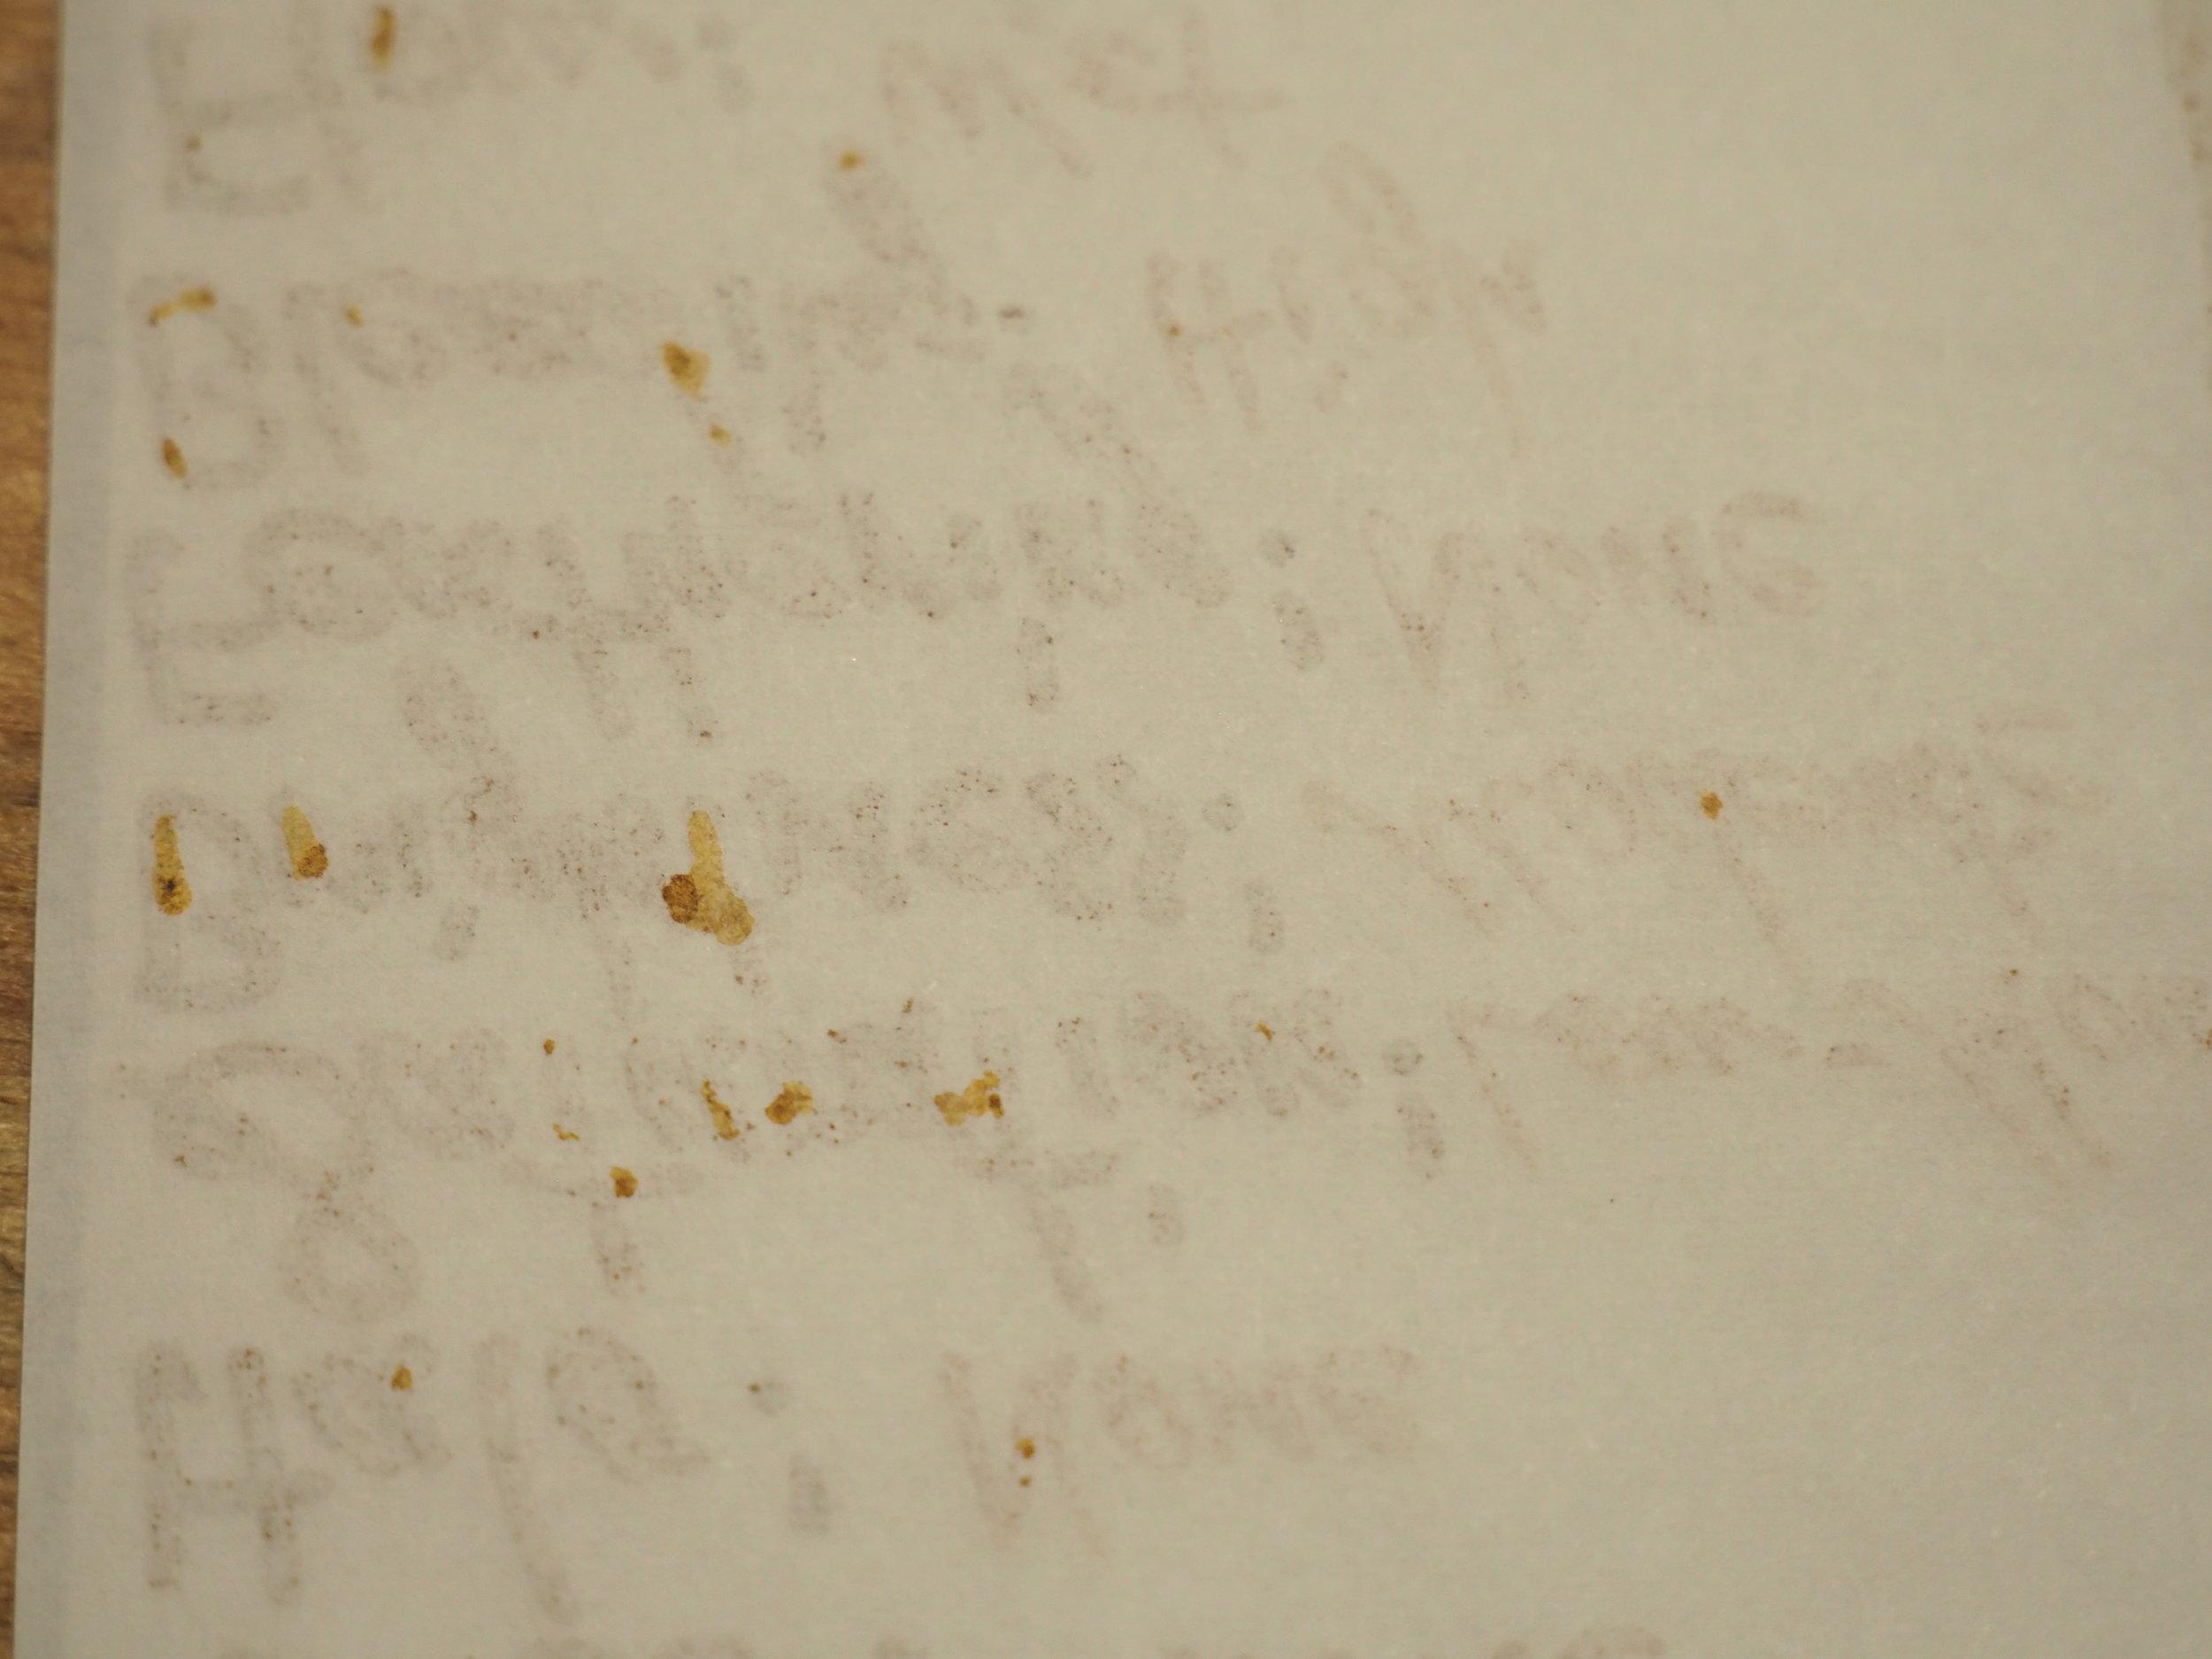 Bleeding (writing) 52gsm TR; back p1